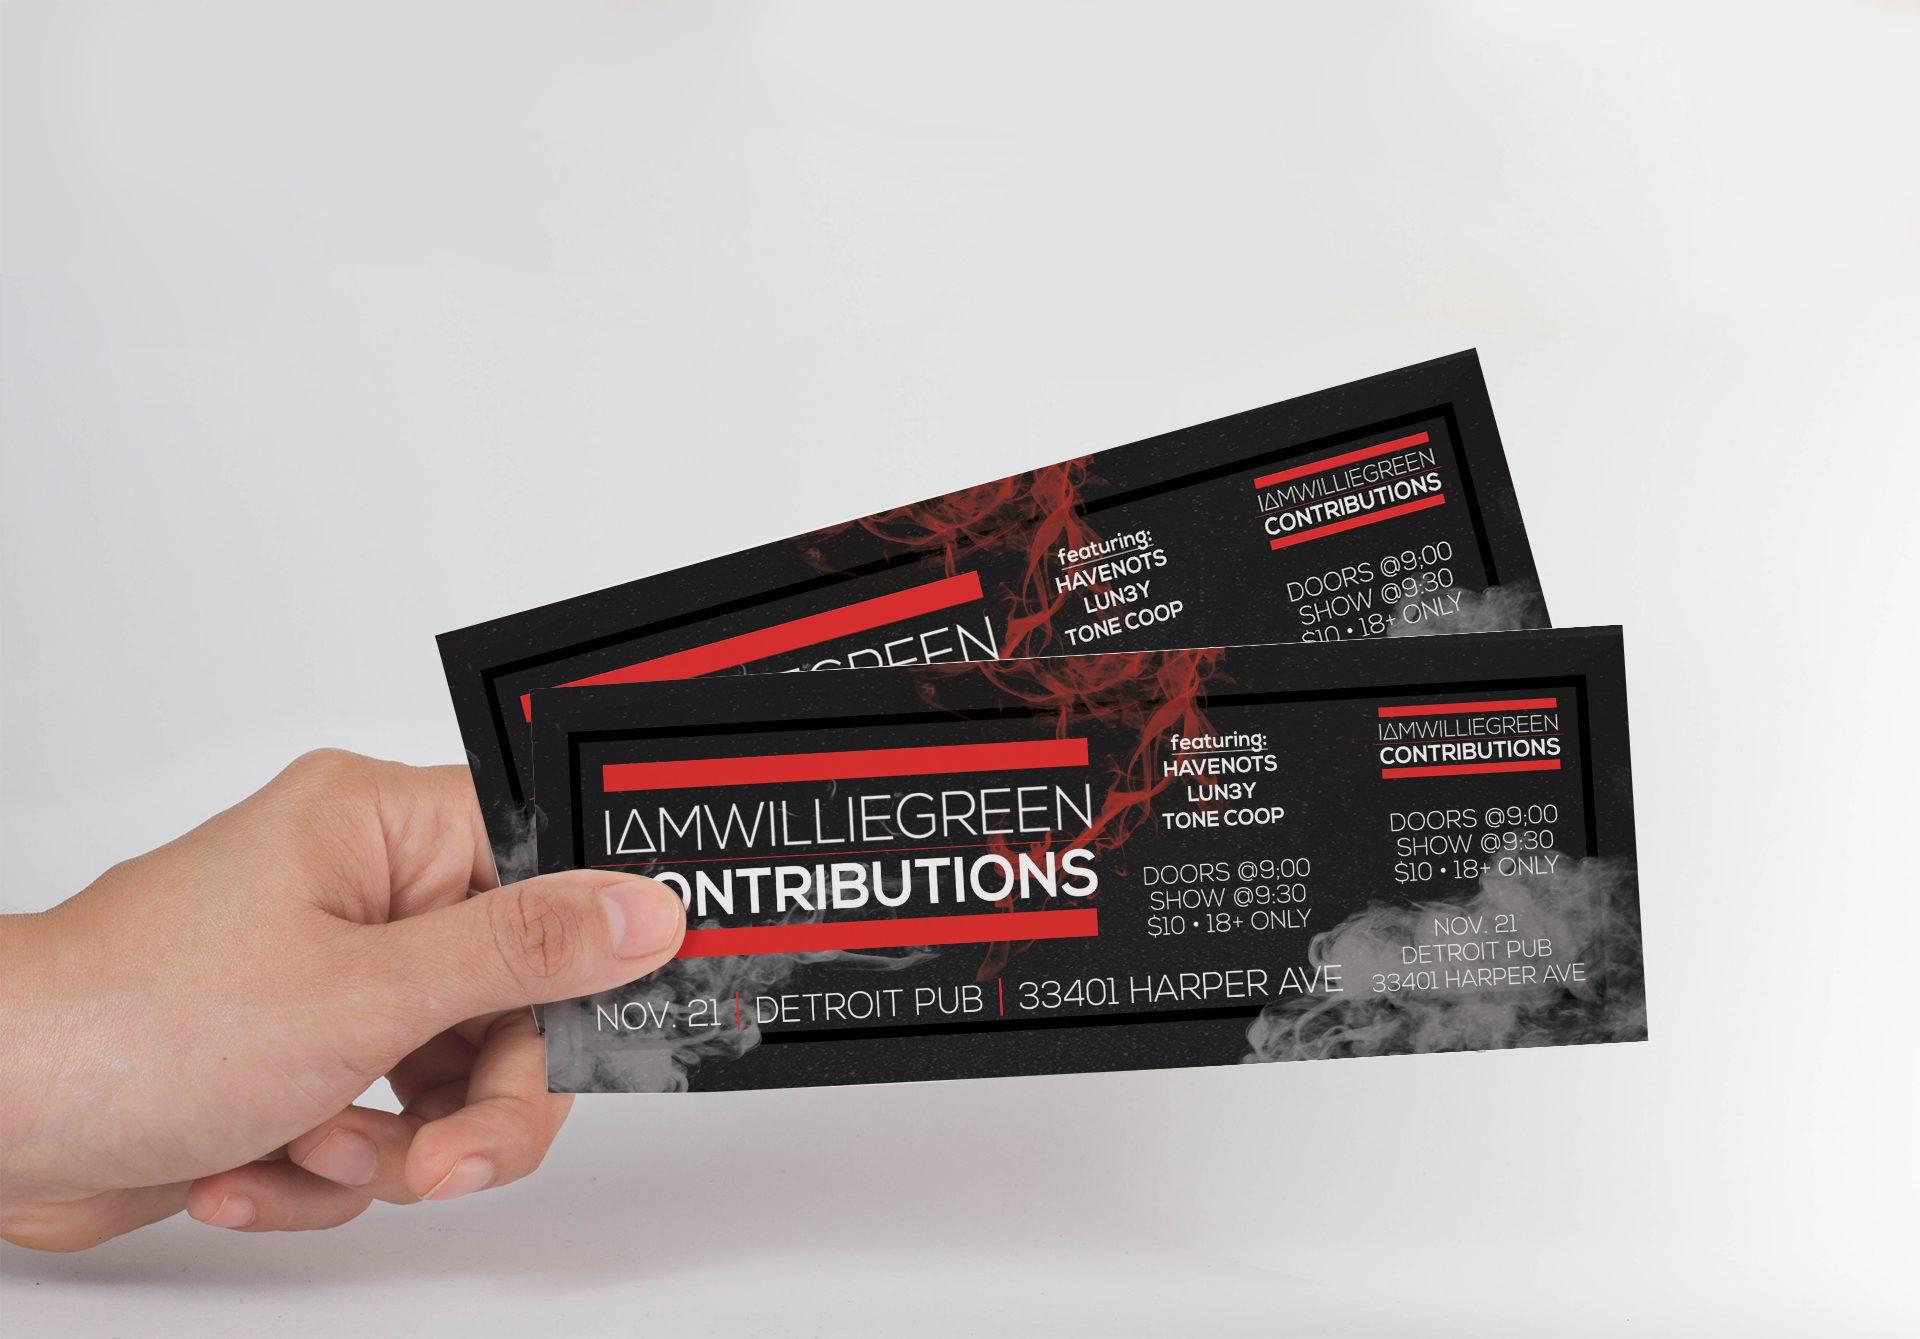 Detroit Pub - Event Tickets with Stub Mockup 03